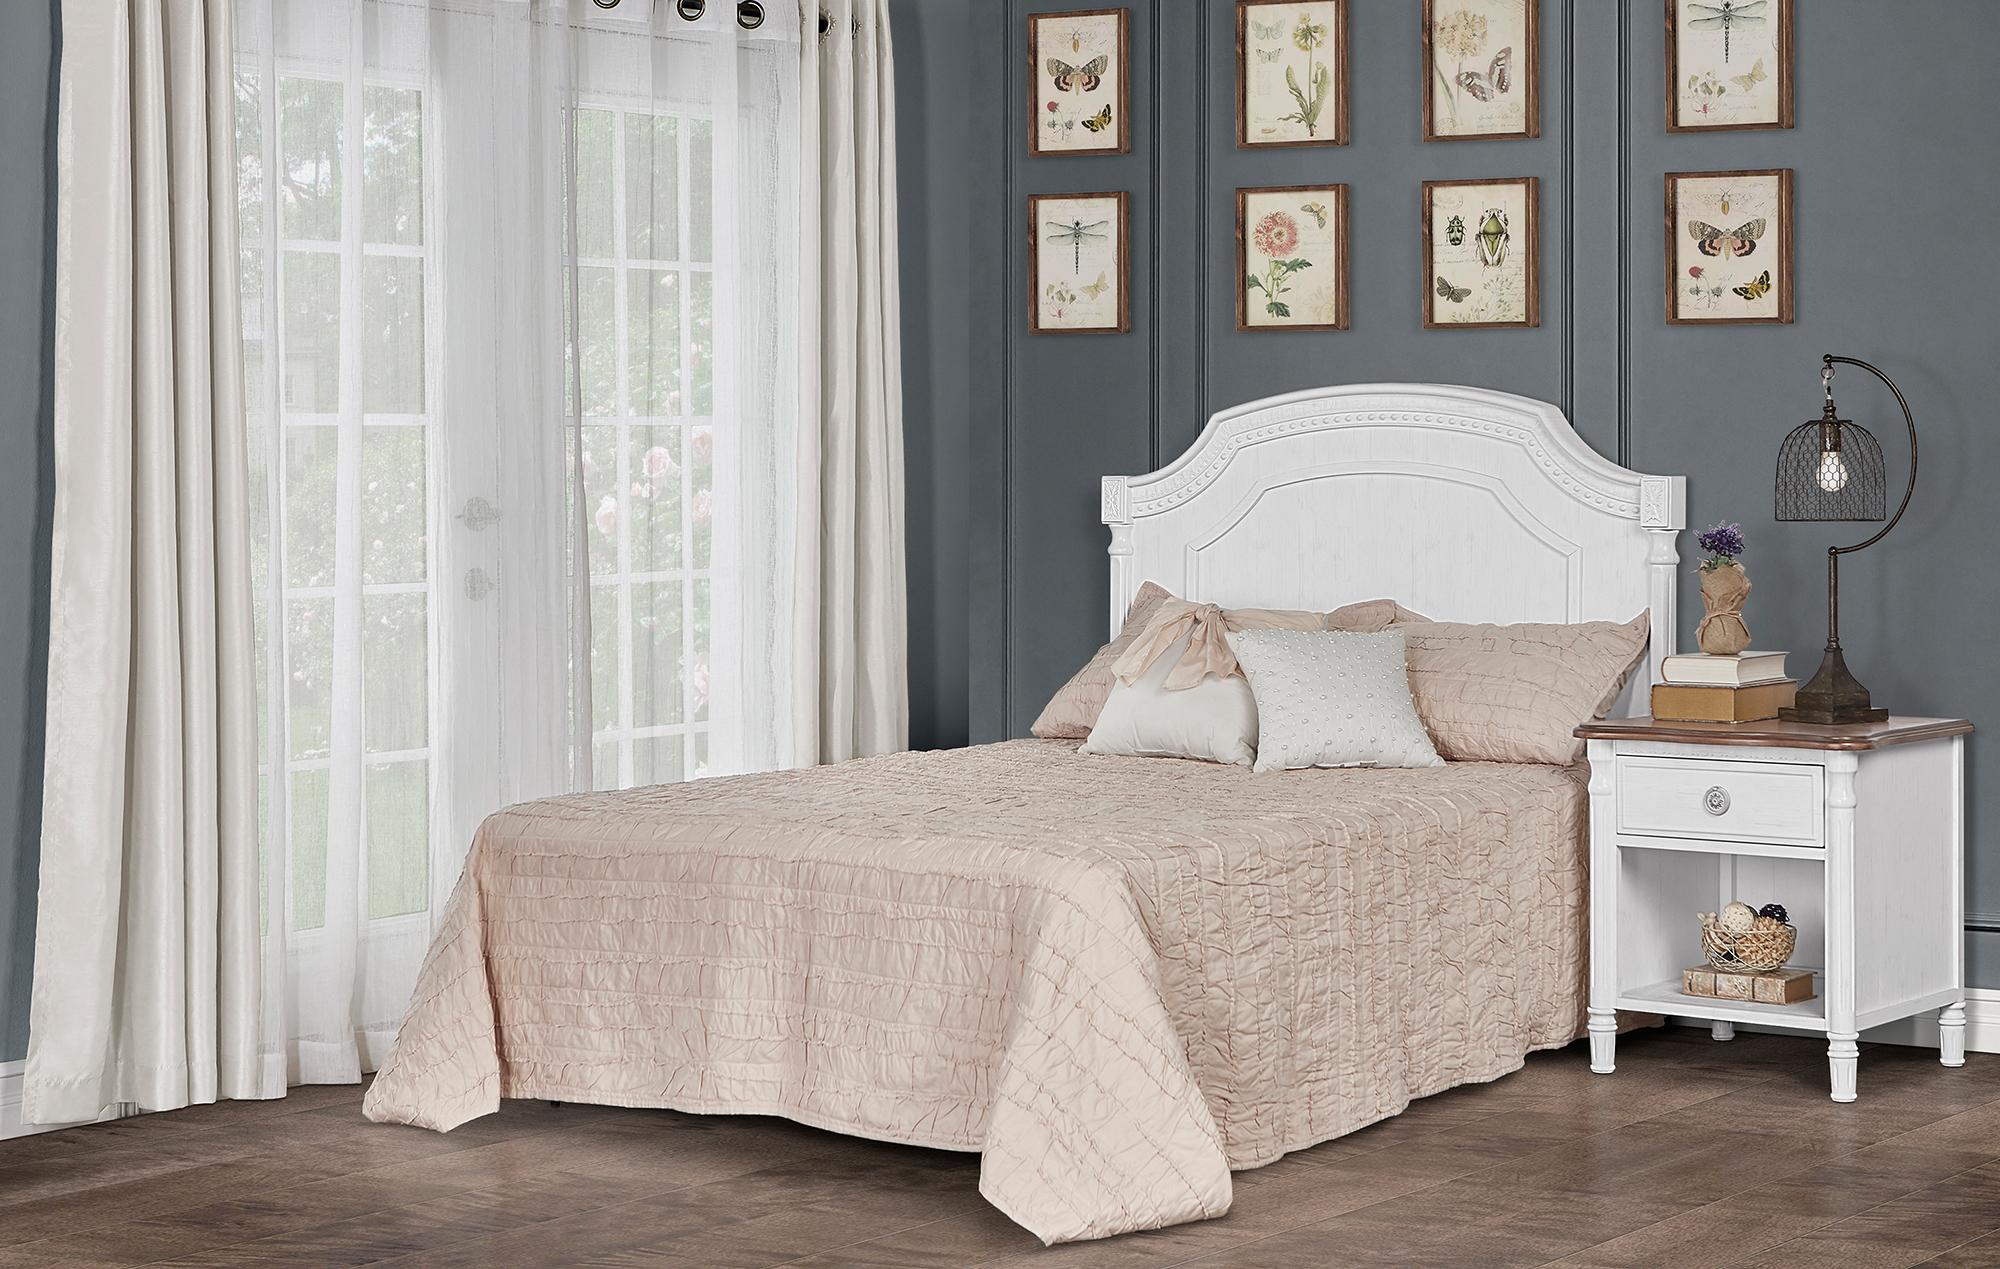 837-BW Evolur Julienne Full Size Bed RS1